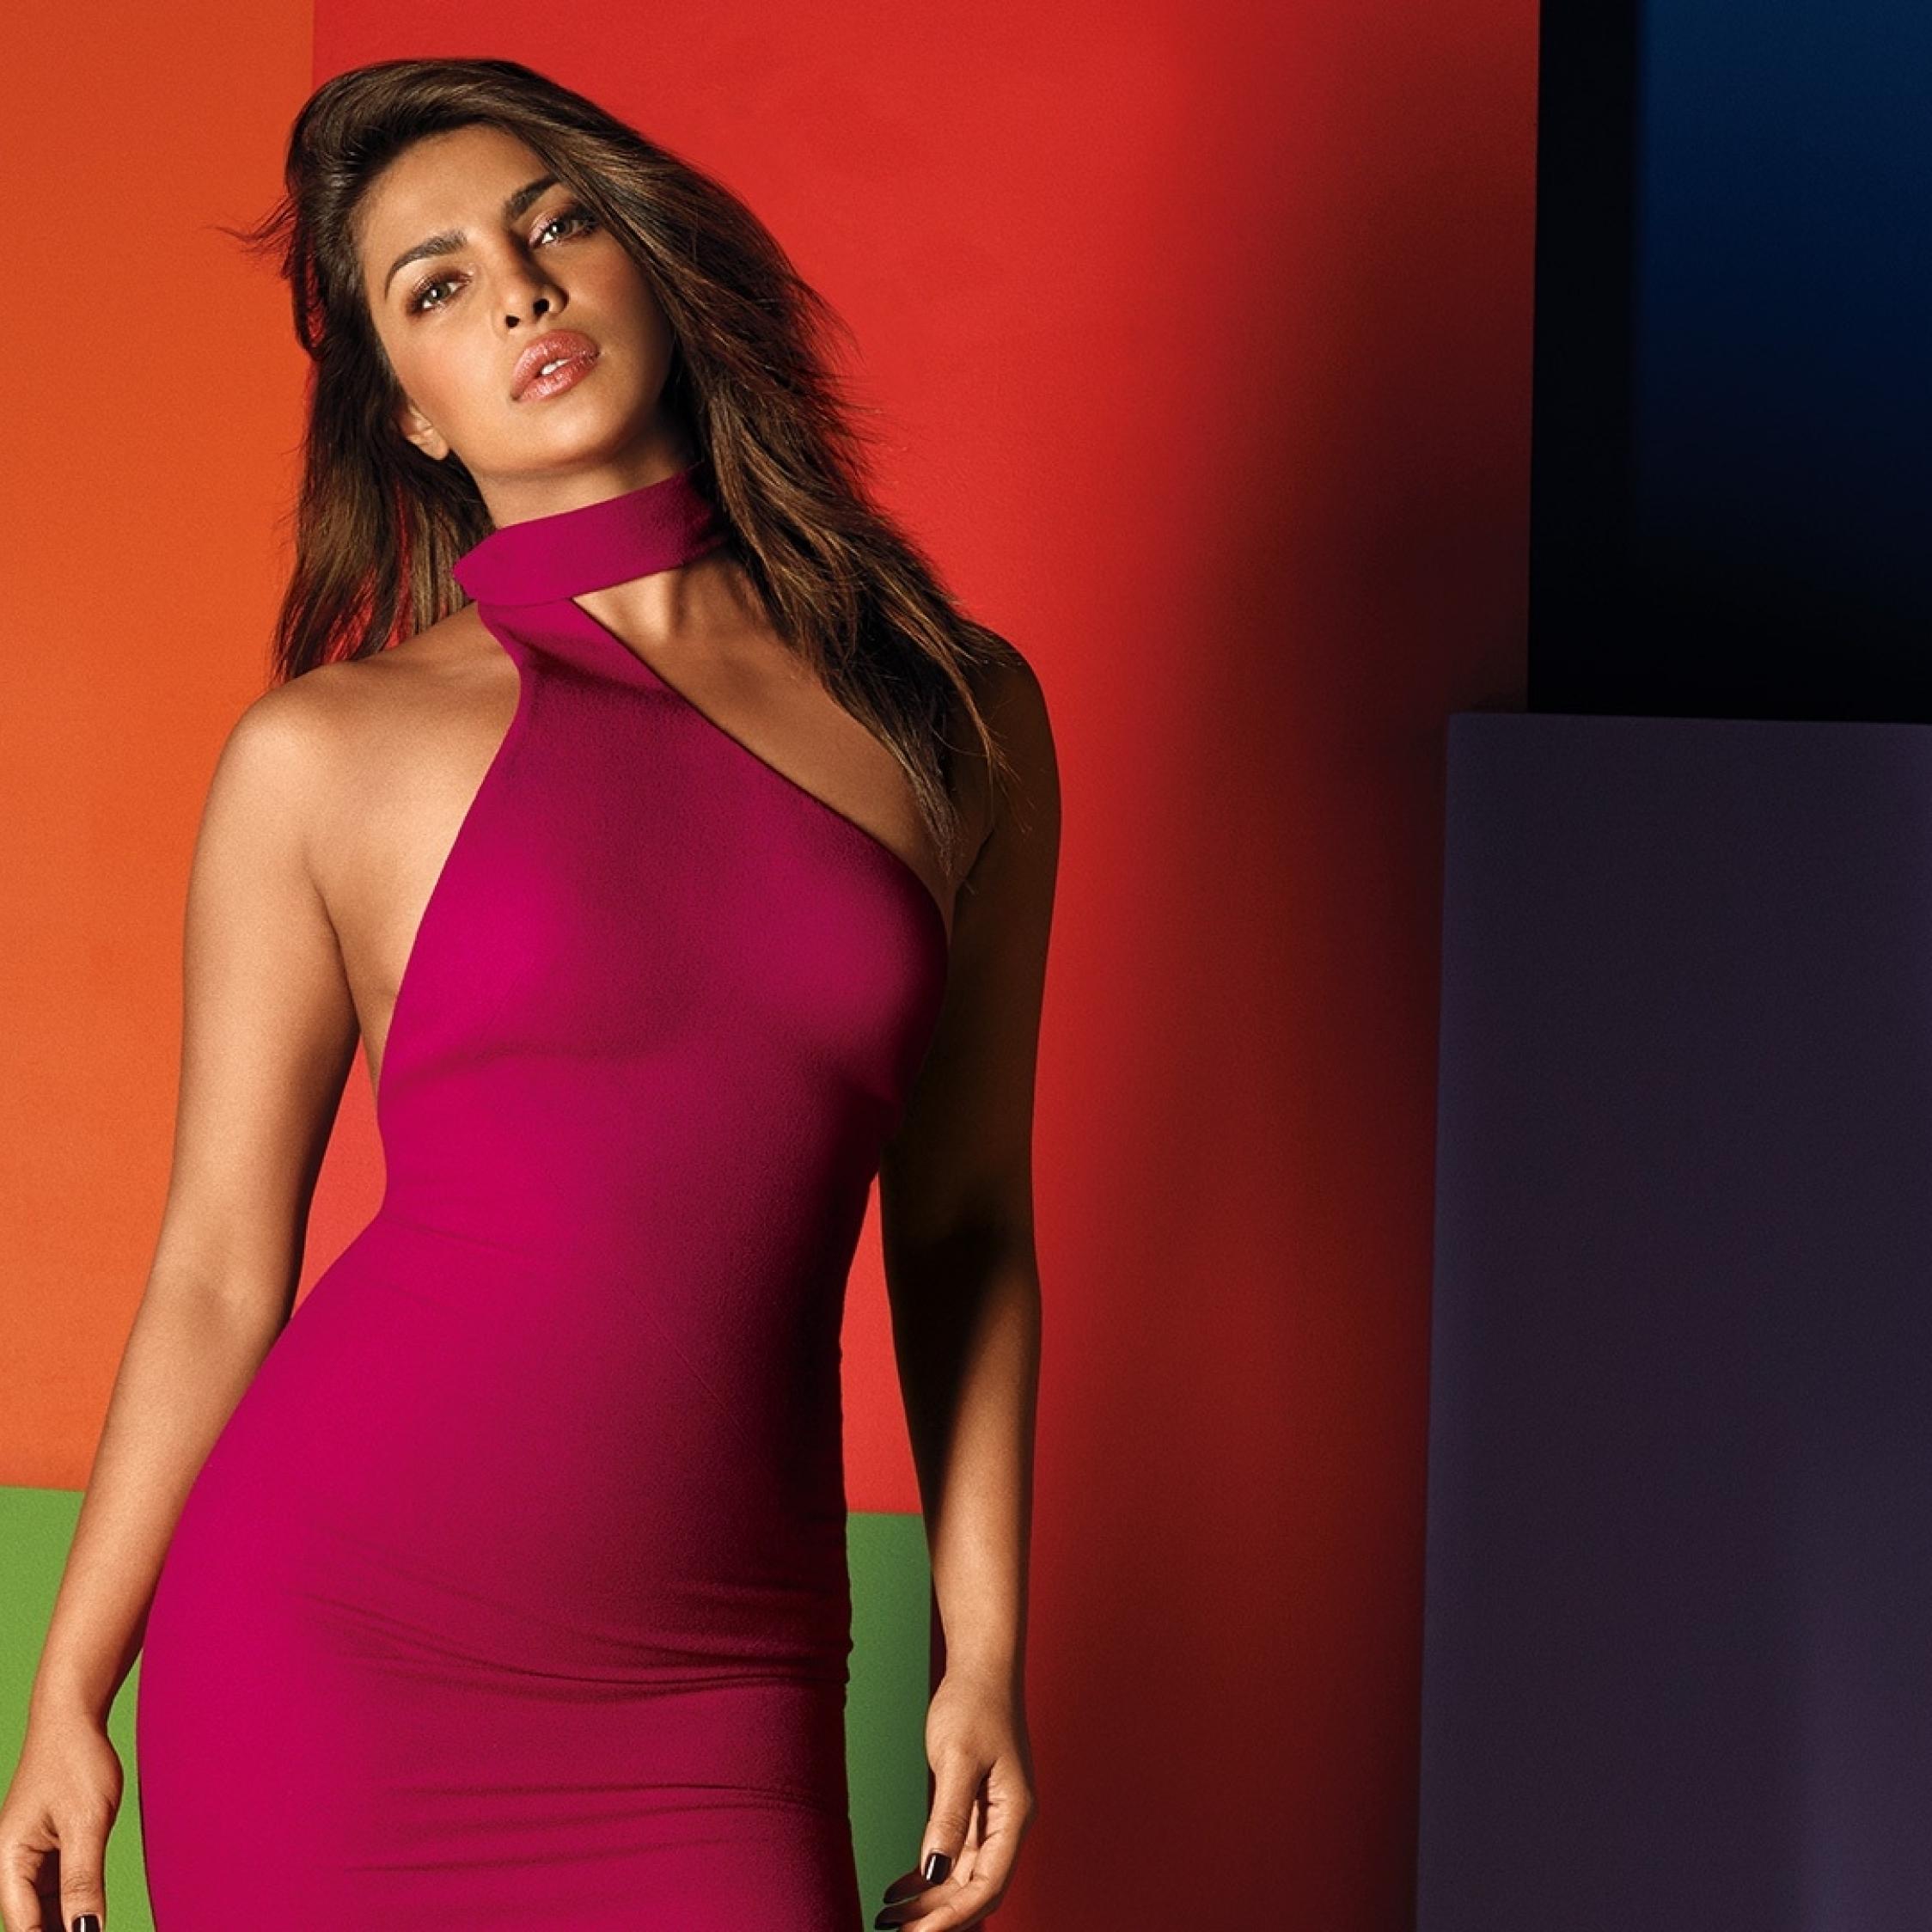 Priyanka Chopra Hot In Pink, Full Hd Wallpaper-9673